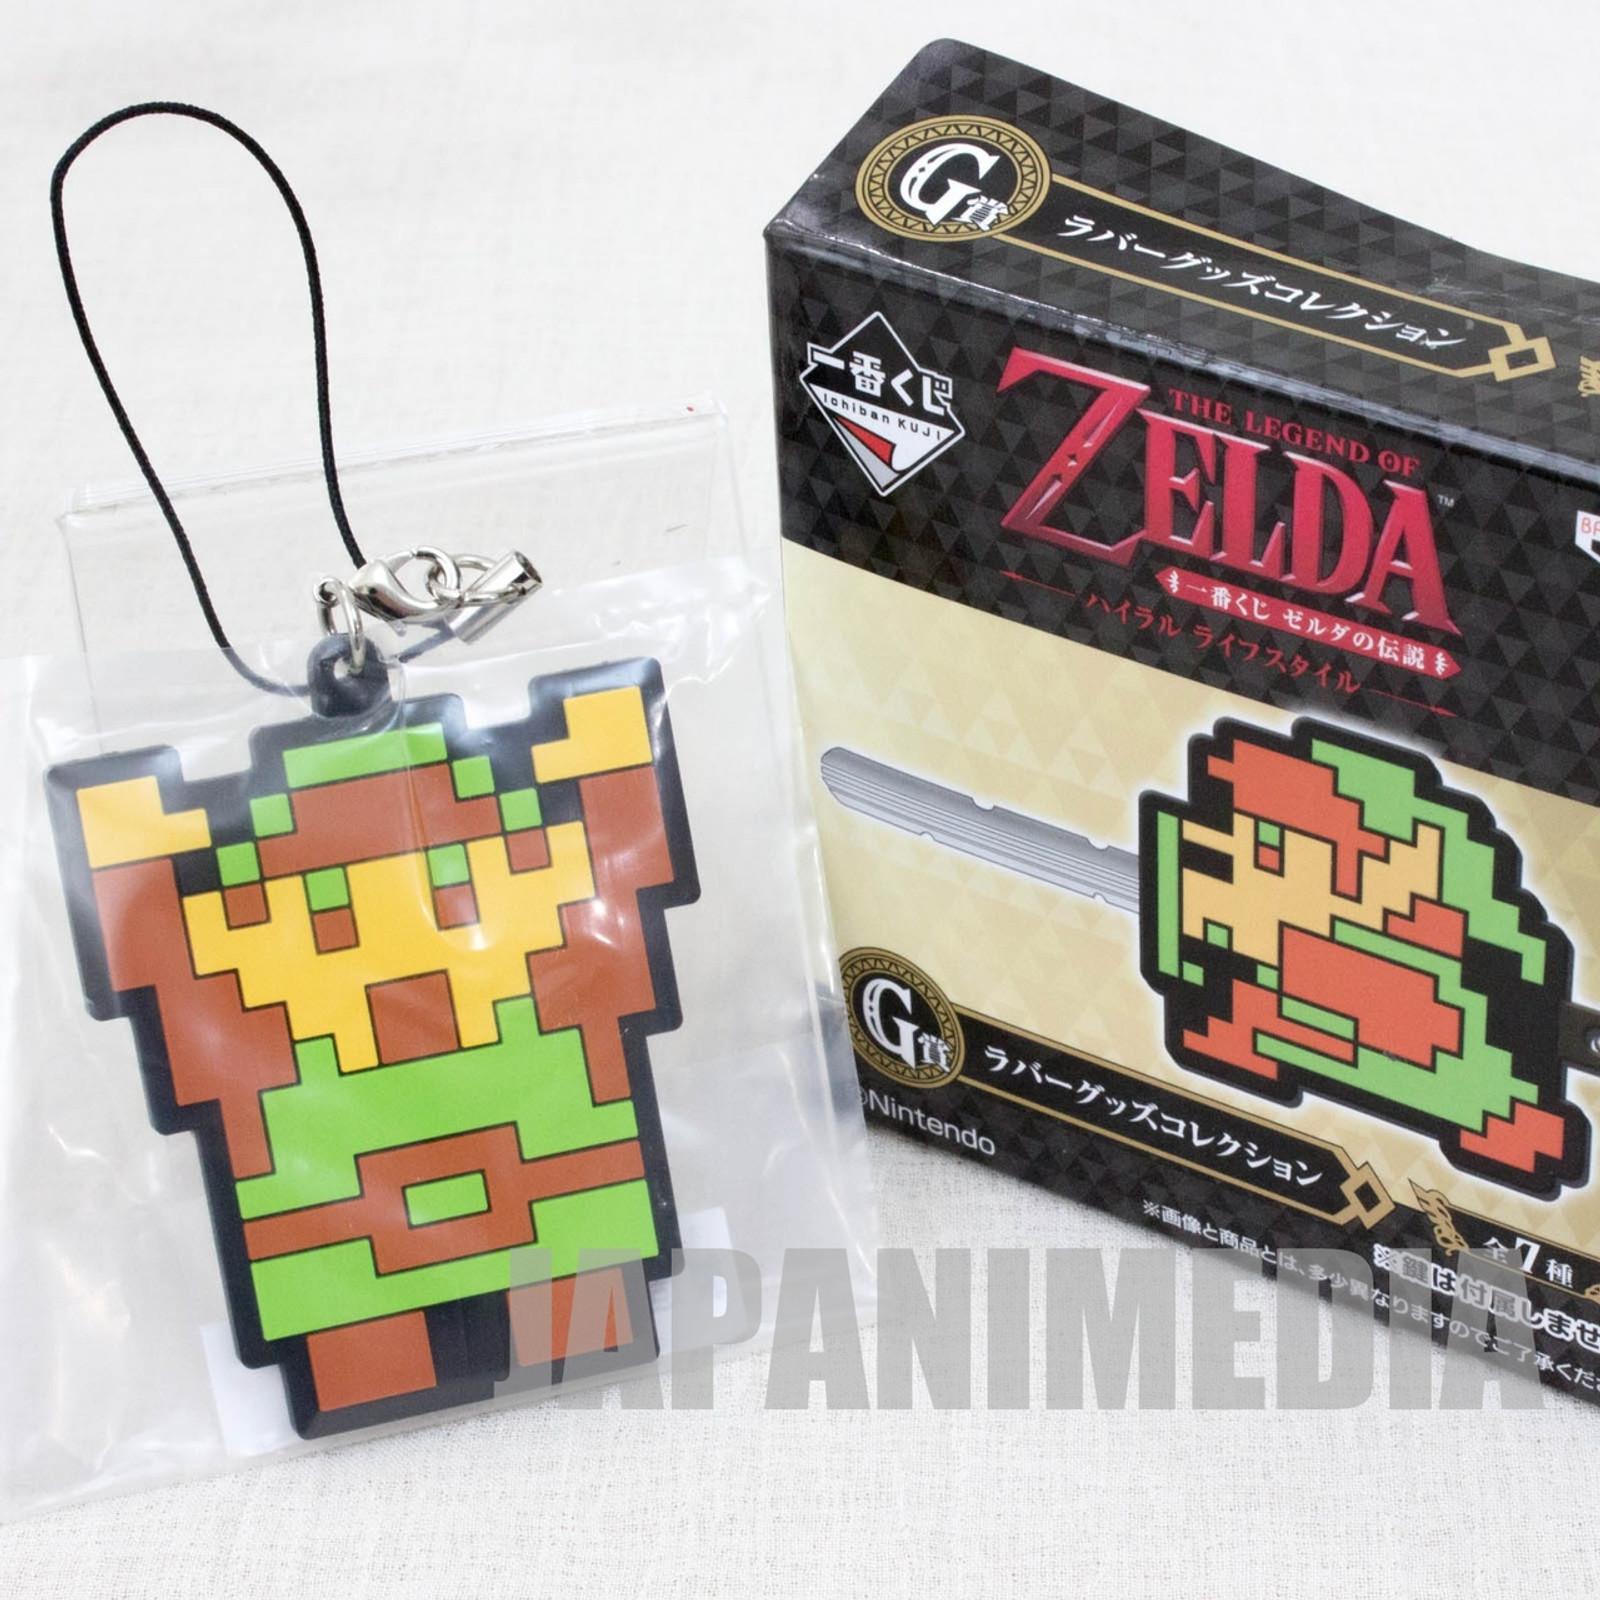 The Legend of Zelda Link Rubber Mascot Strap Nintendo JAPAN FAMICOM NES